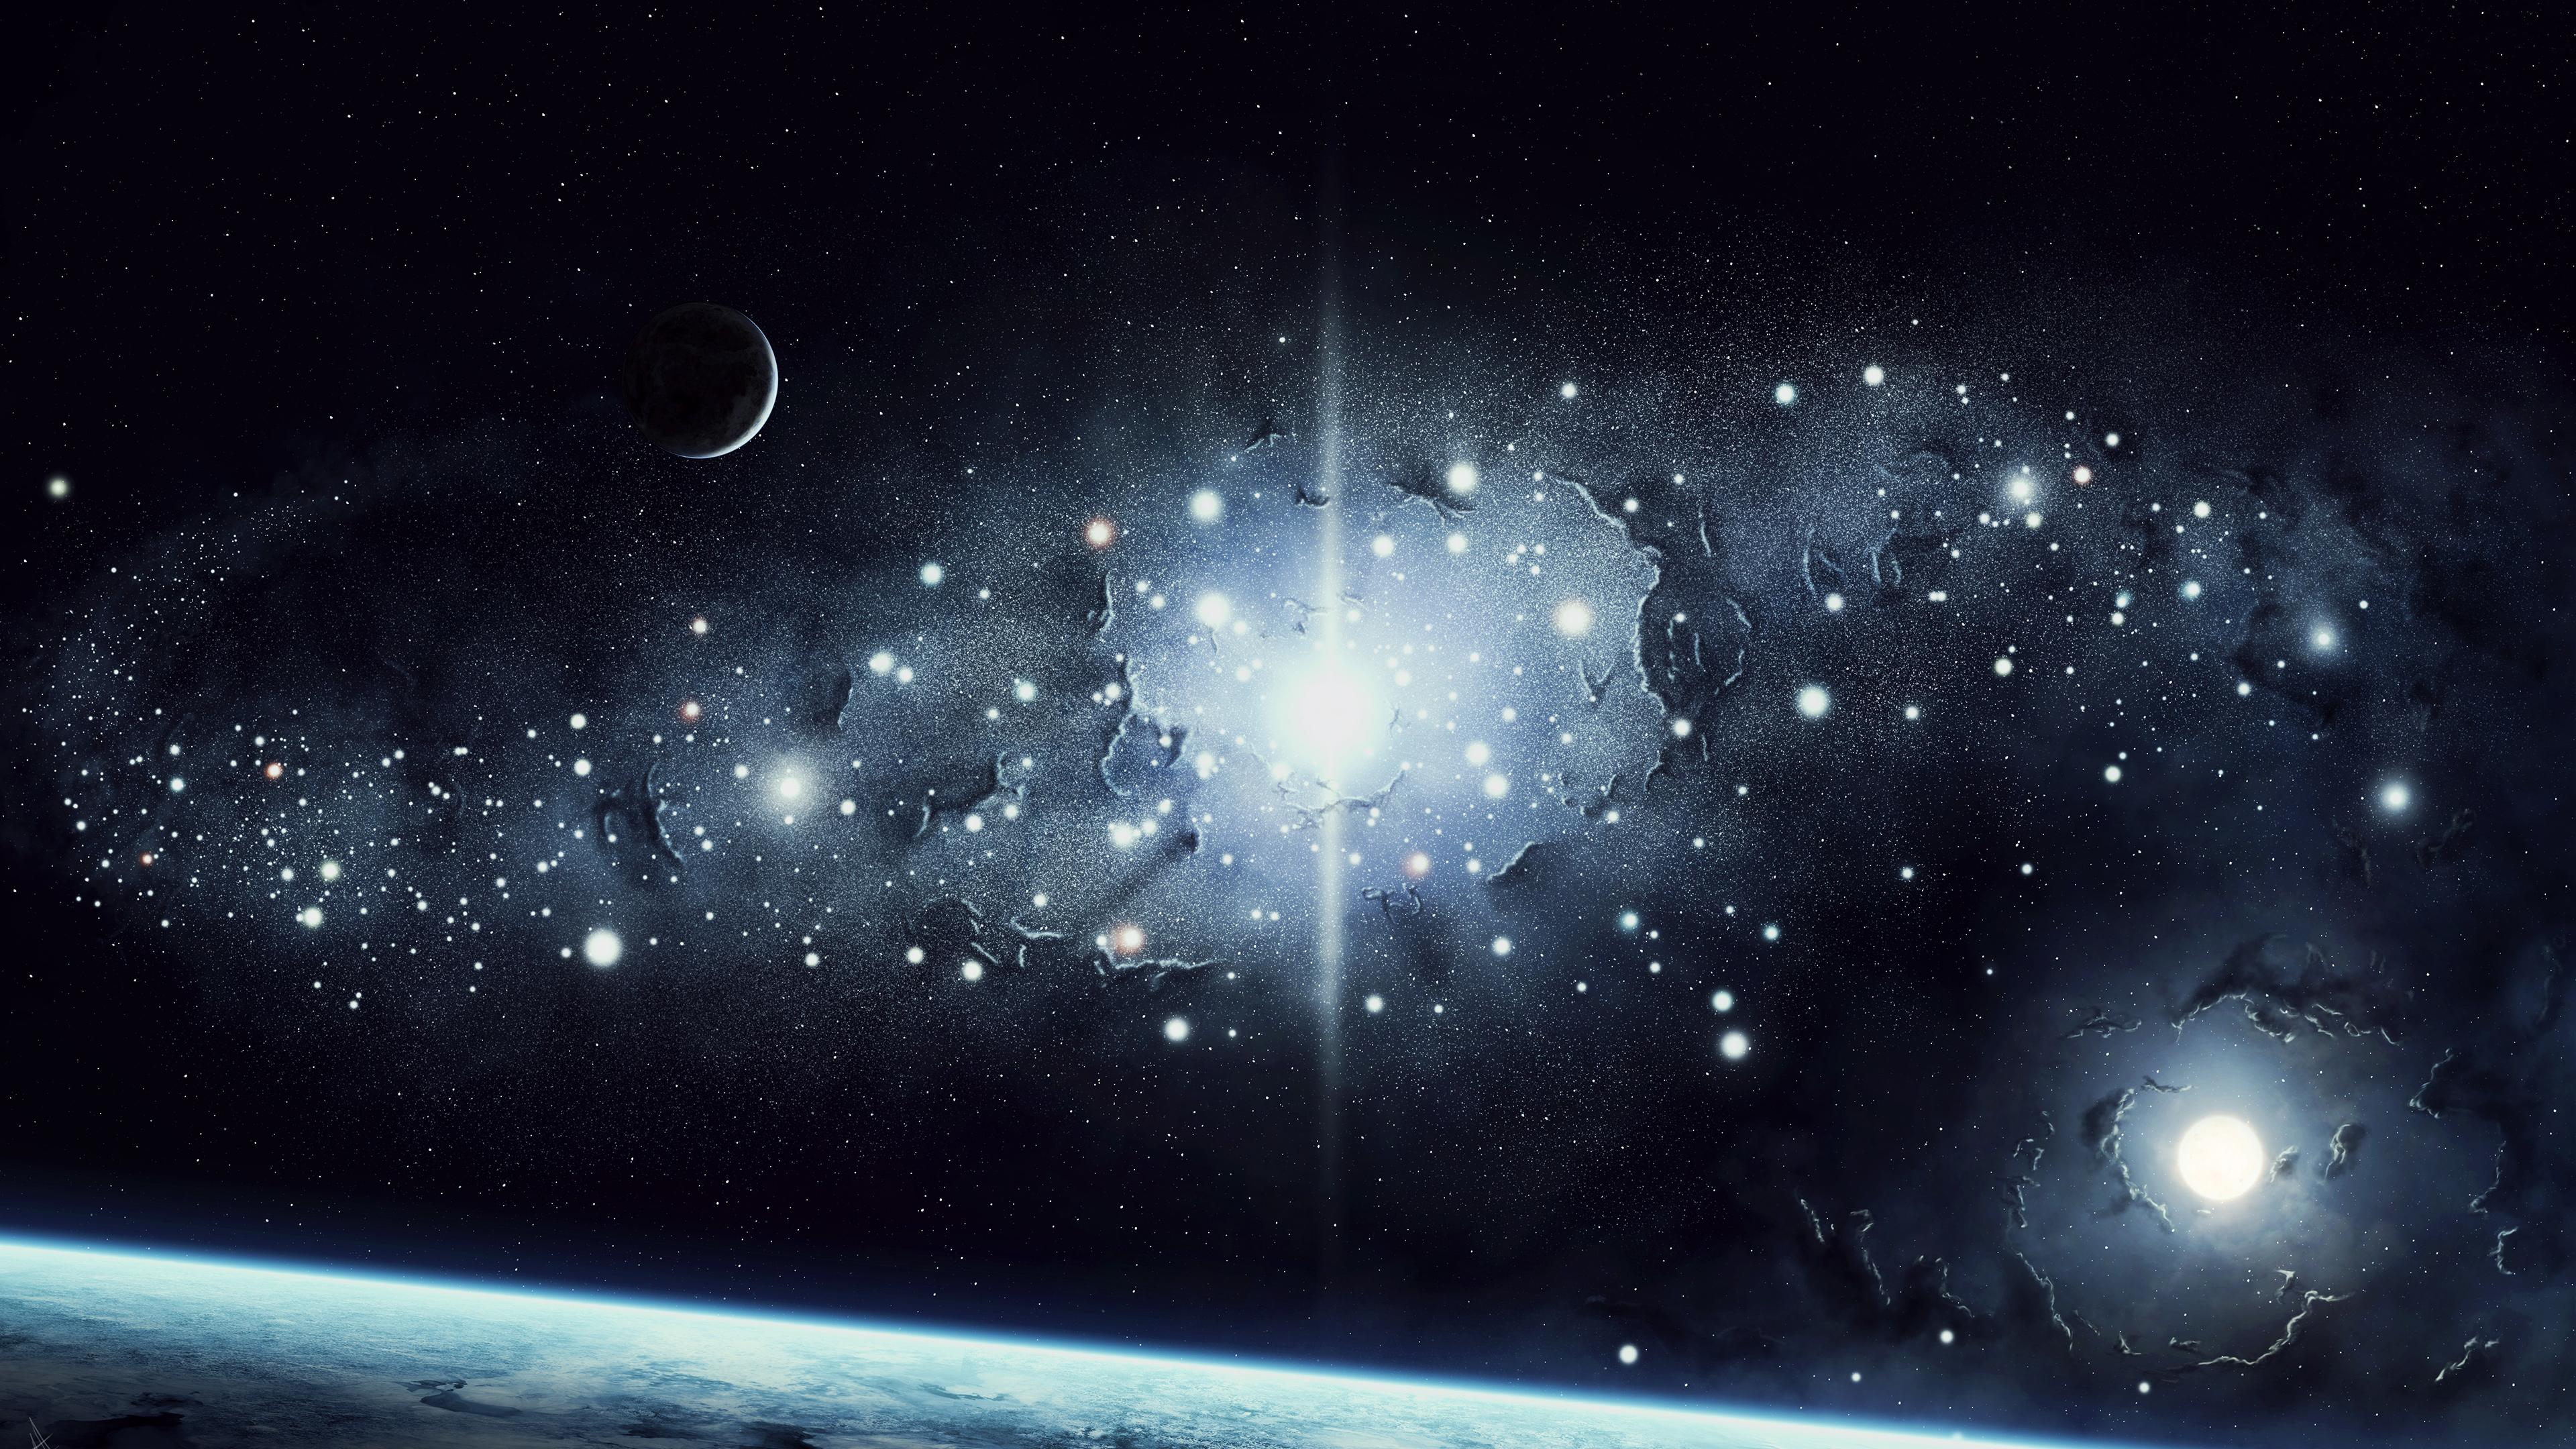 Картинки небо звезды планеты, открытки днем